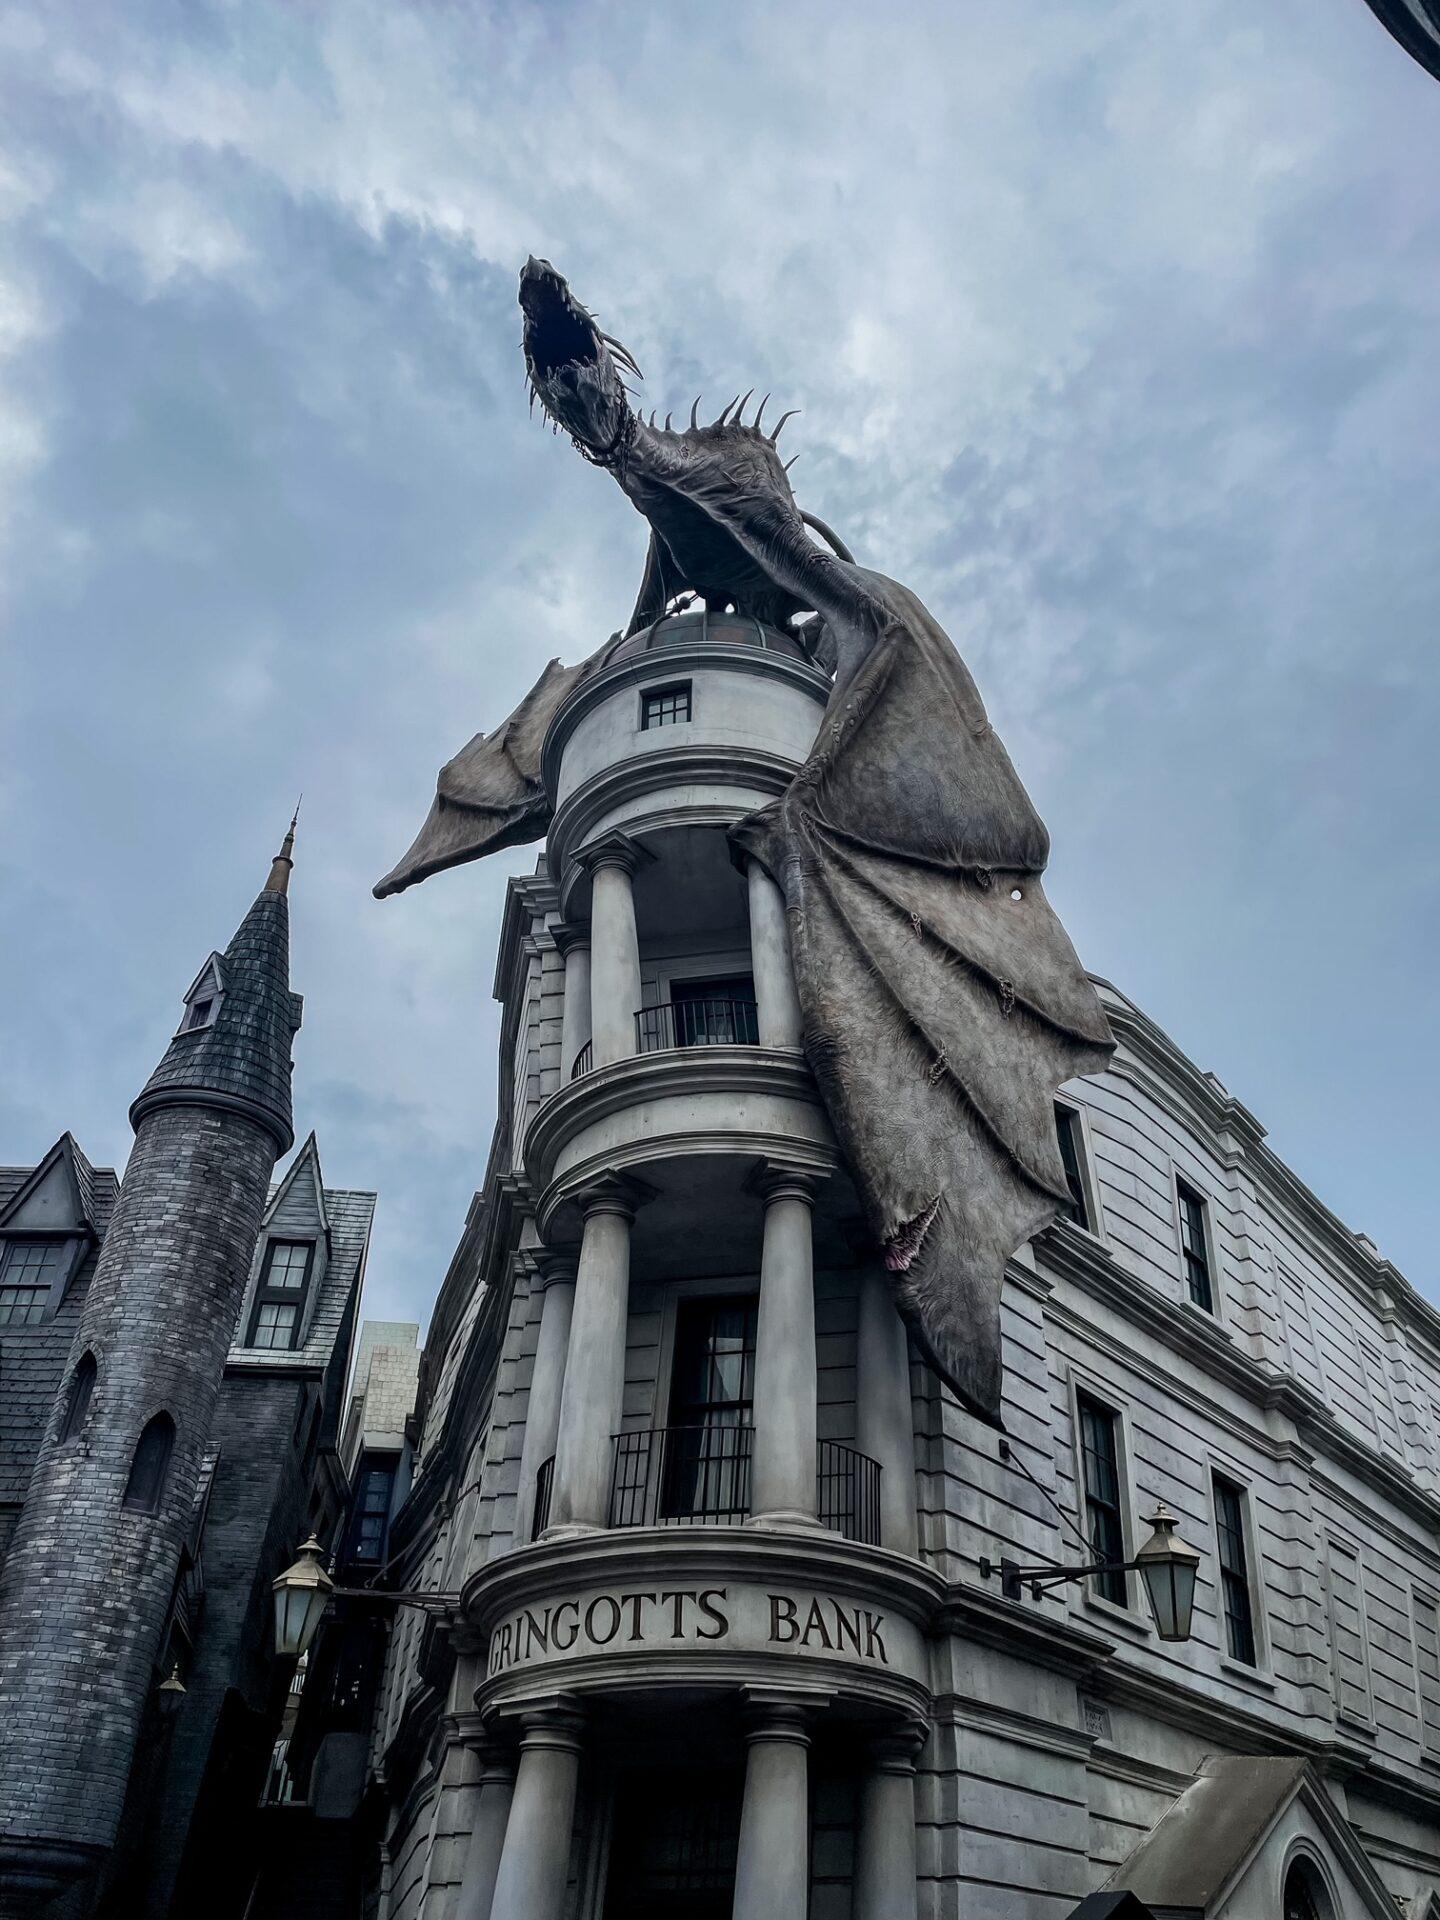 Escape from Gringott's - Universal Studios Orlando